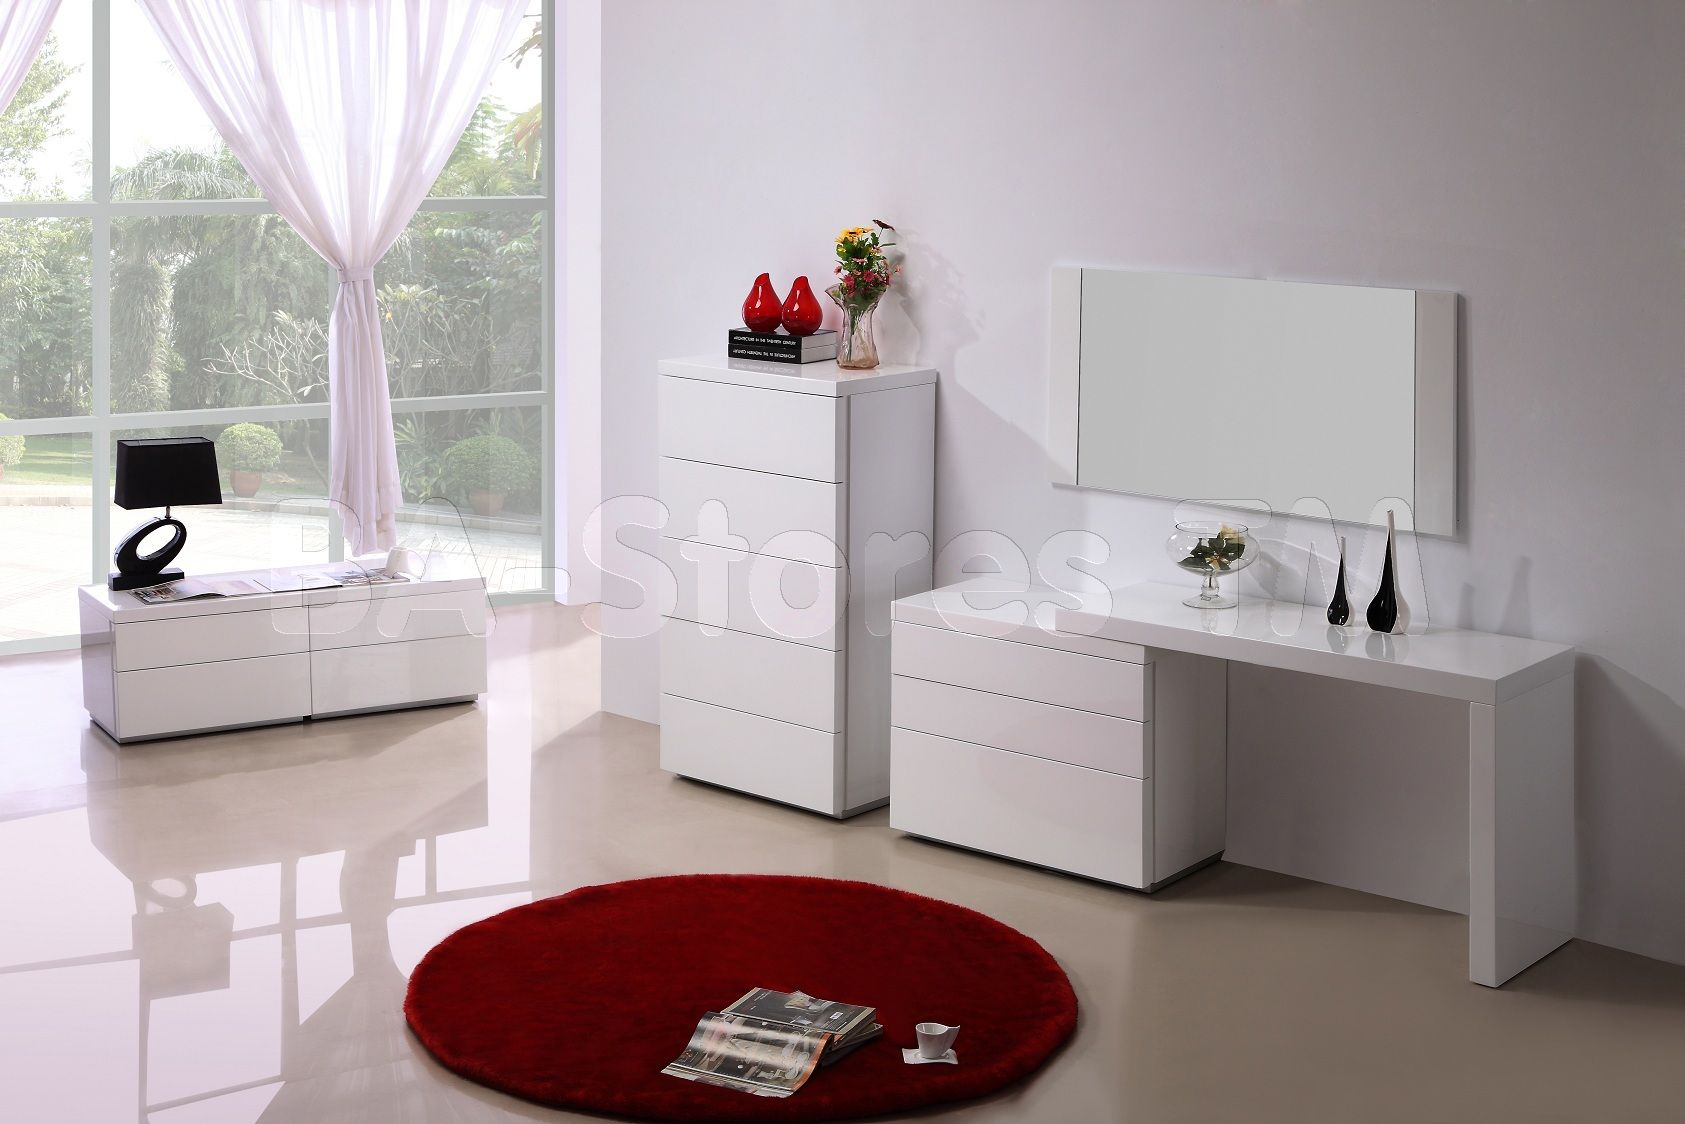 Design Barcelona Contemporary White Bedroom Furniture Modern SetsWhite Bedroom  Furniture Design Barcelona Contemporary . White Bedroom